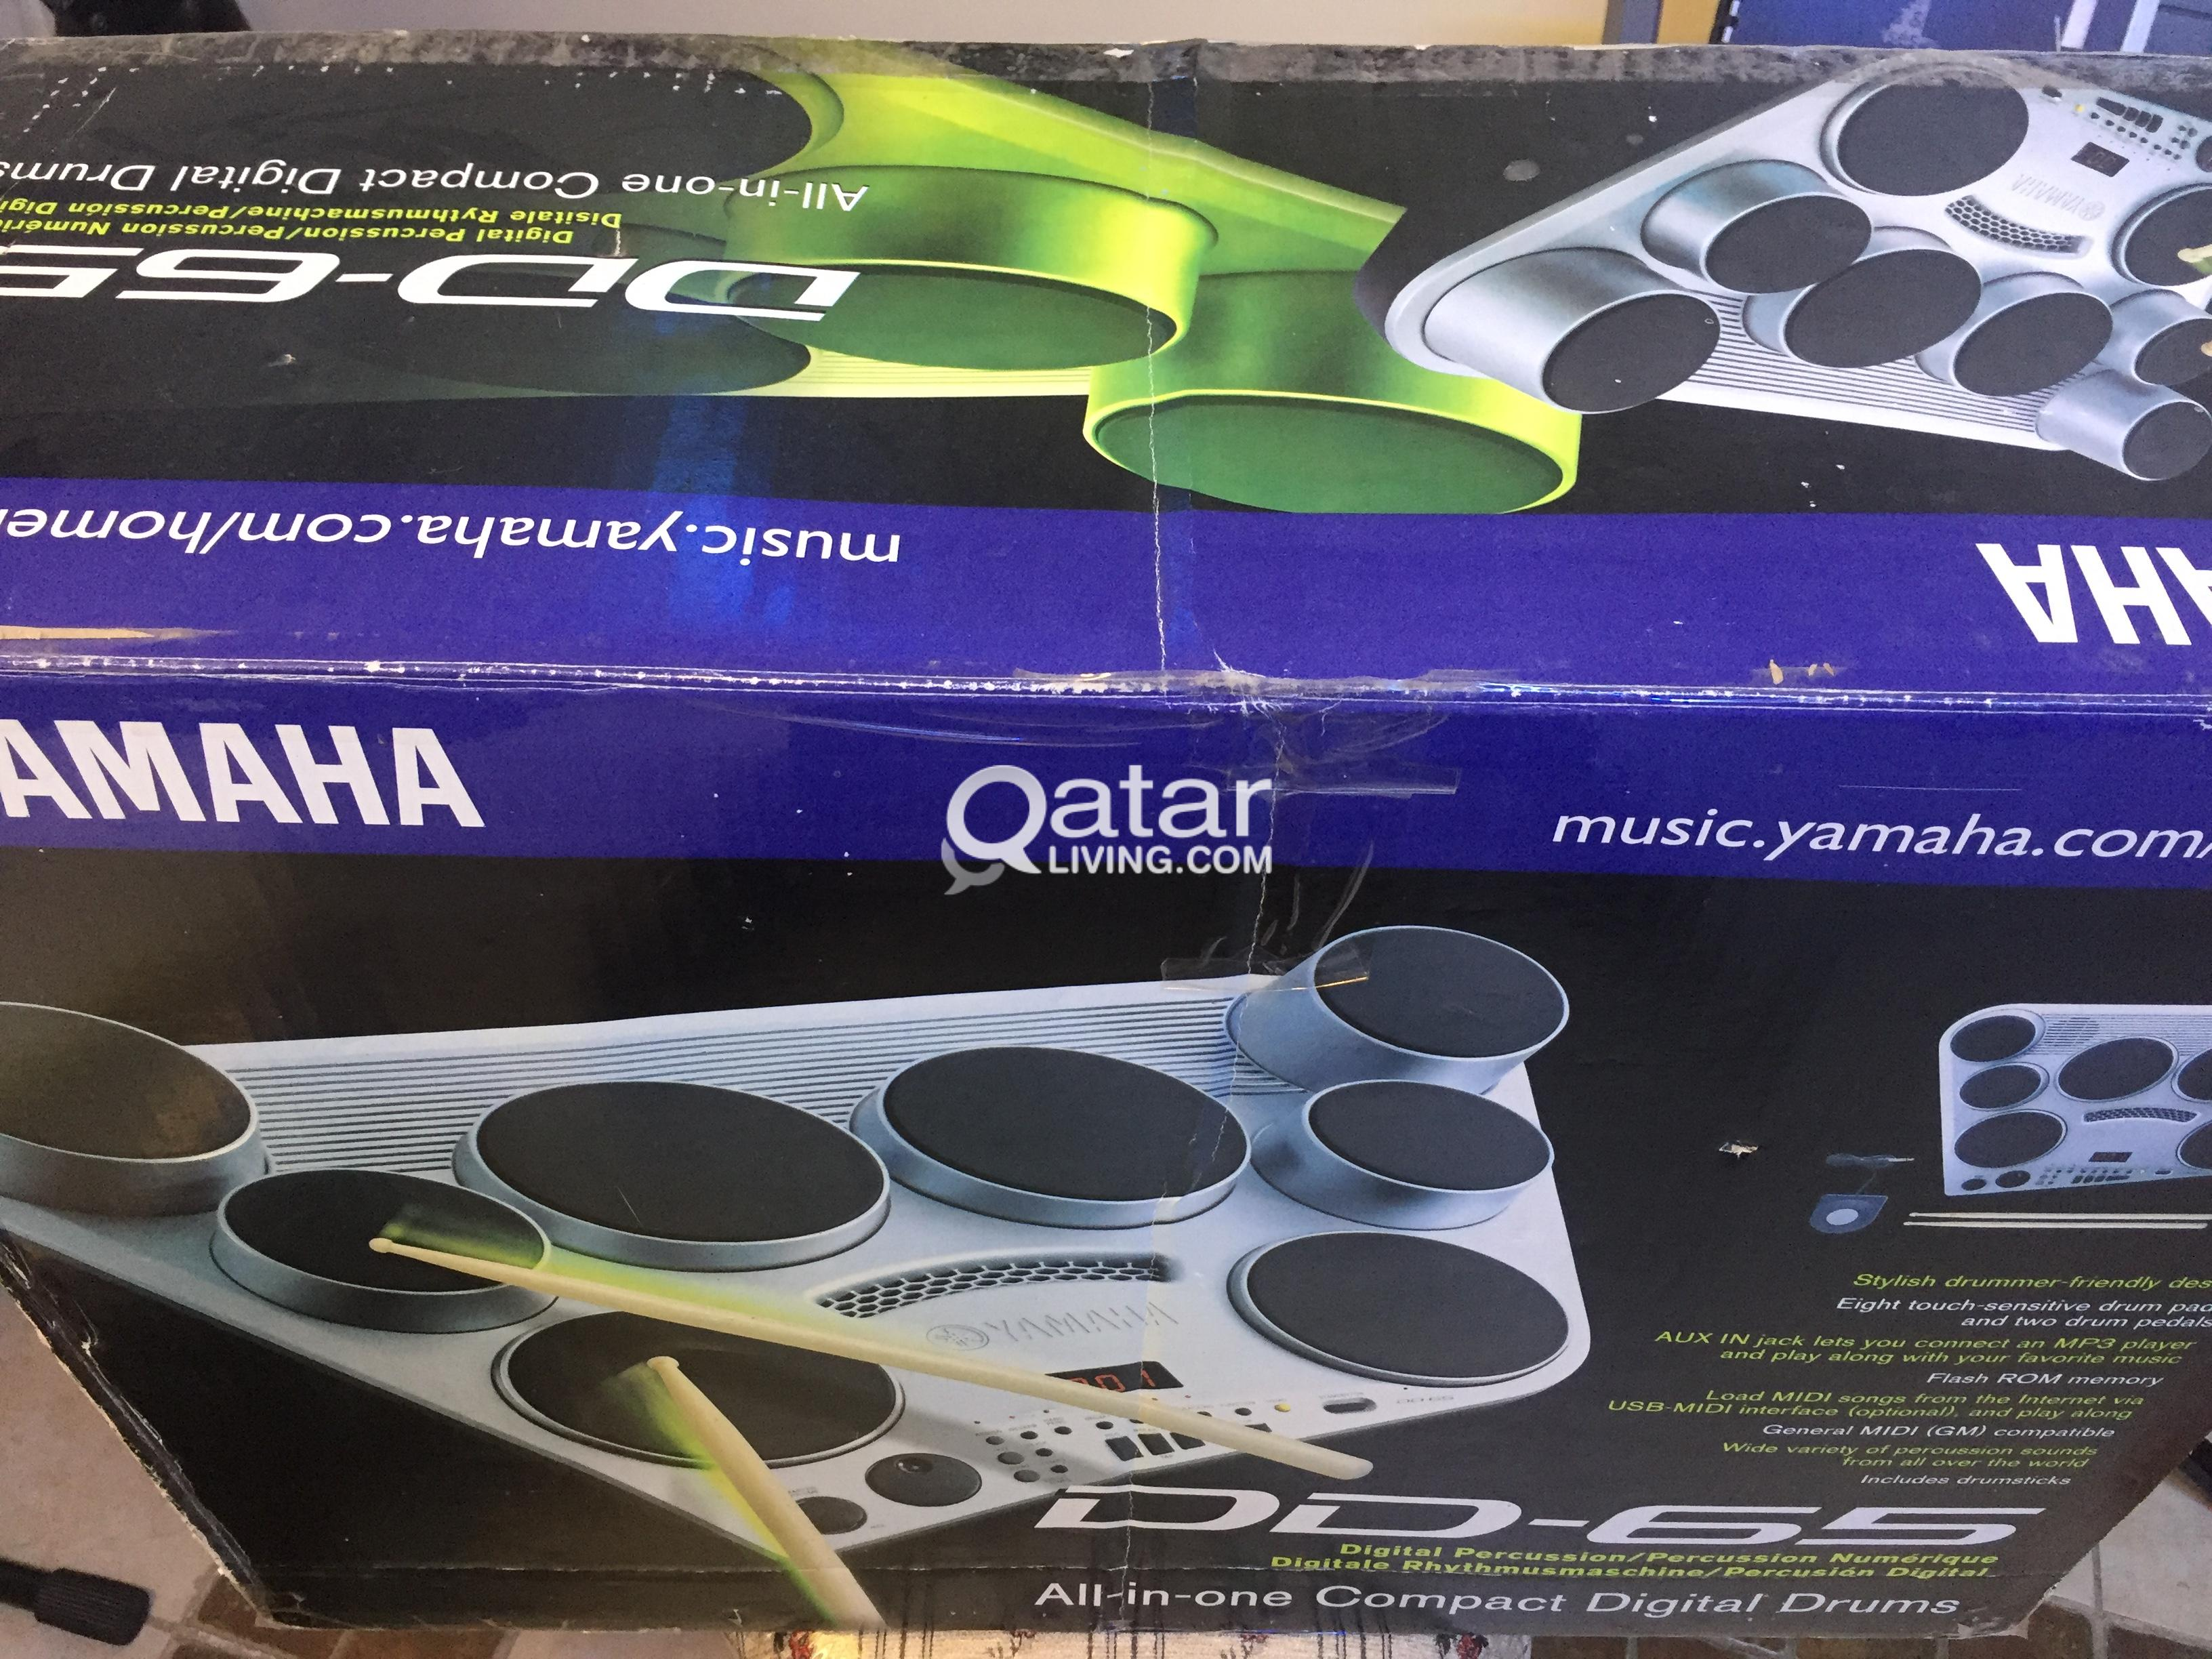 Yamaha DD 65 - compact digital drums | Qatar Living